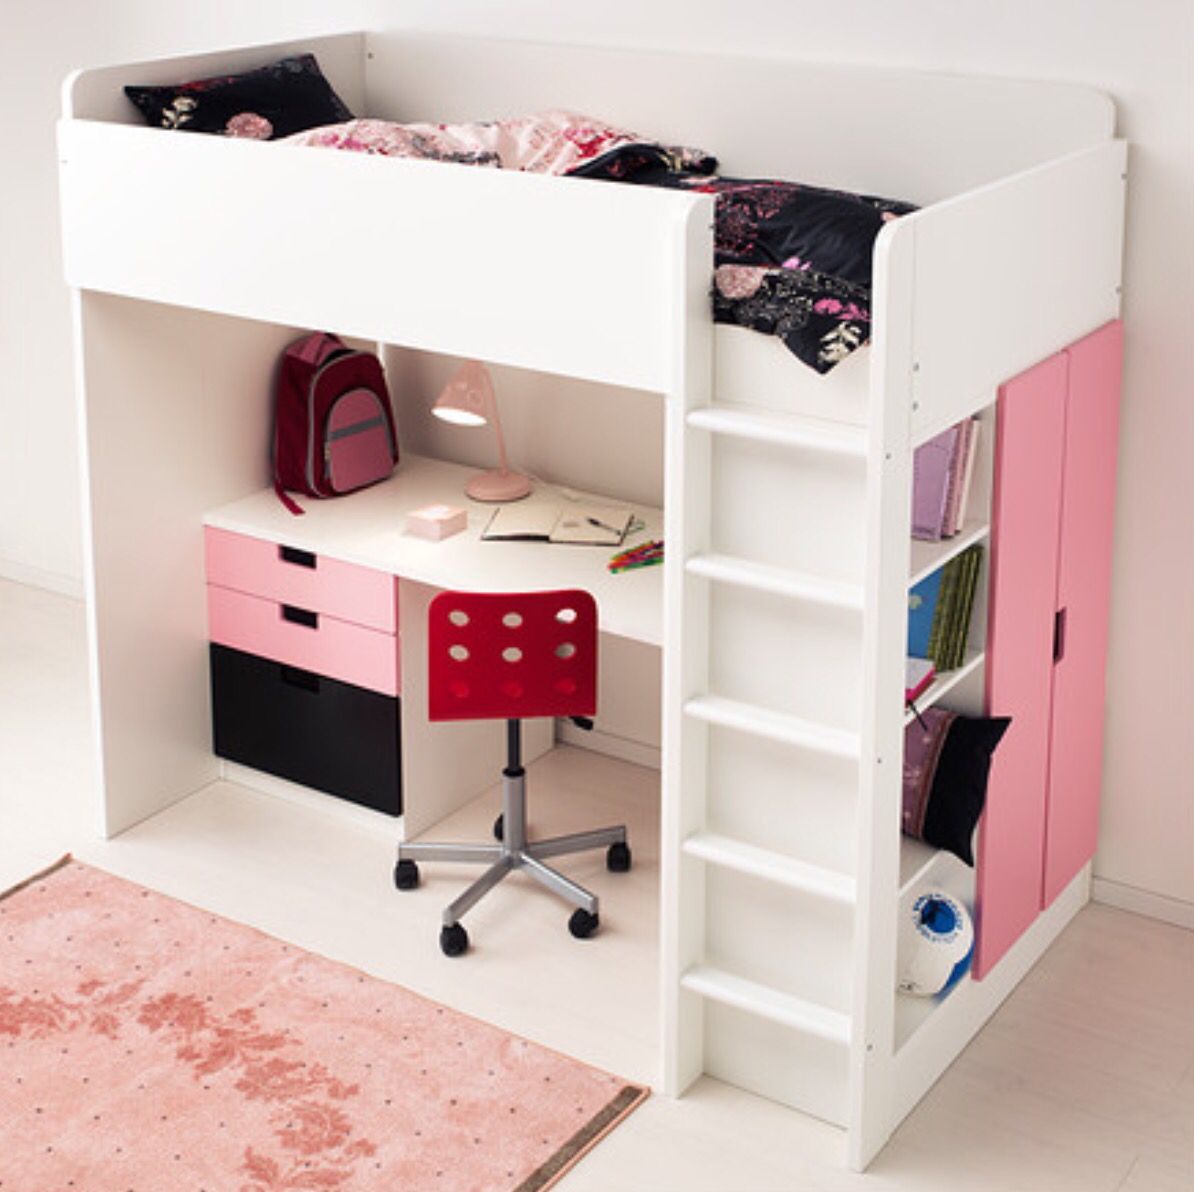 Stuva hoogslaper Kinderkamer Kinderbed, Bed met bureau